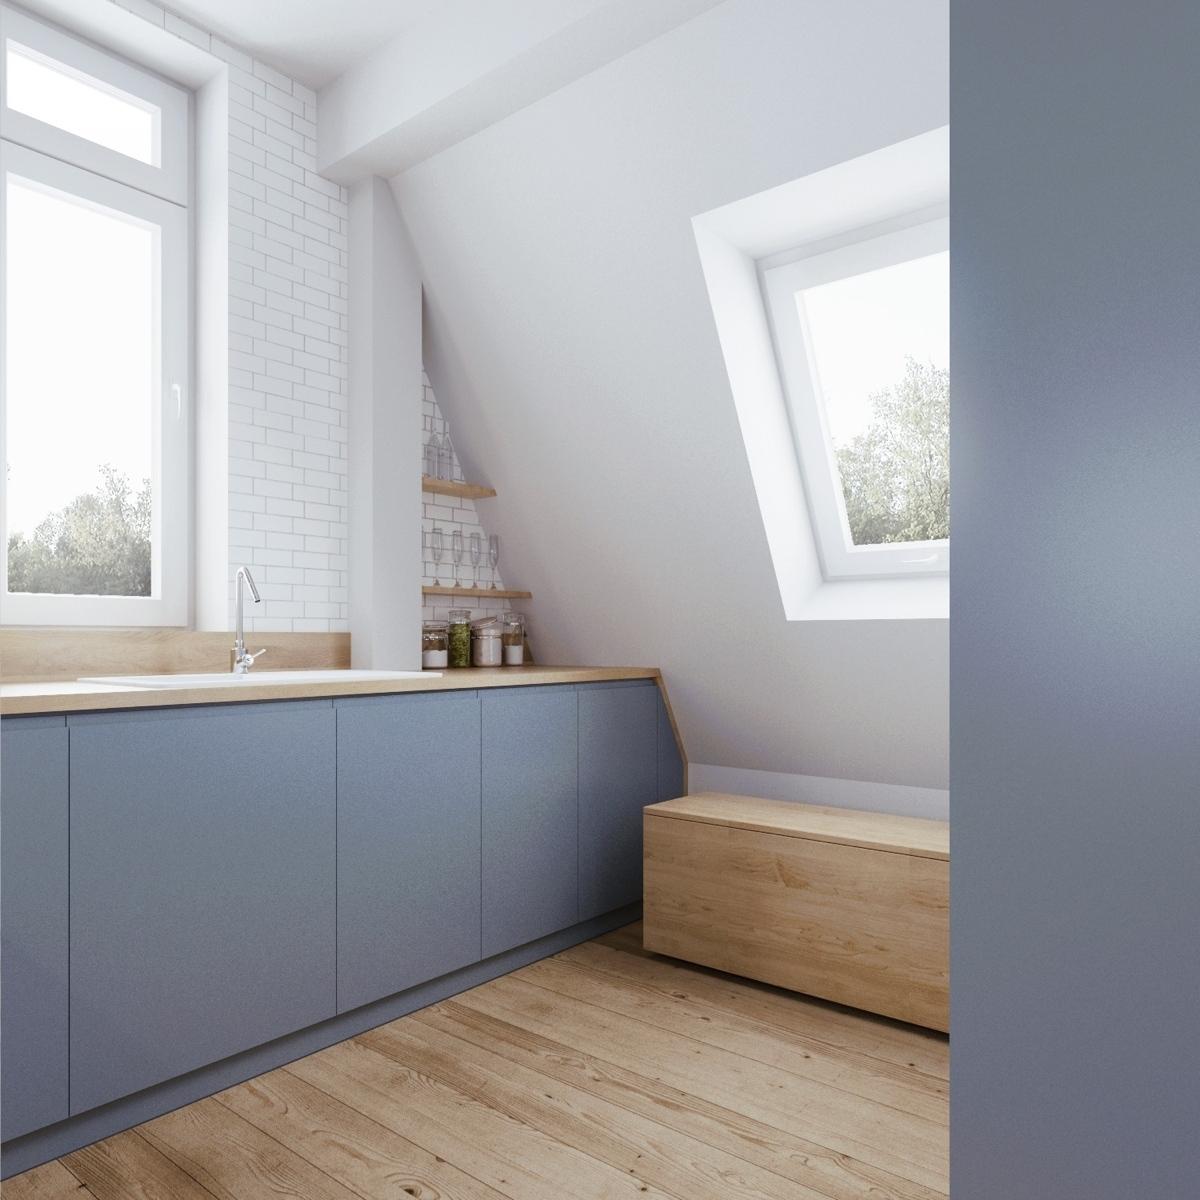 Minimalist kitchen design ideas